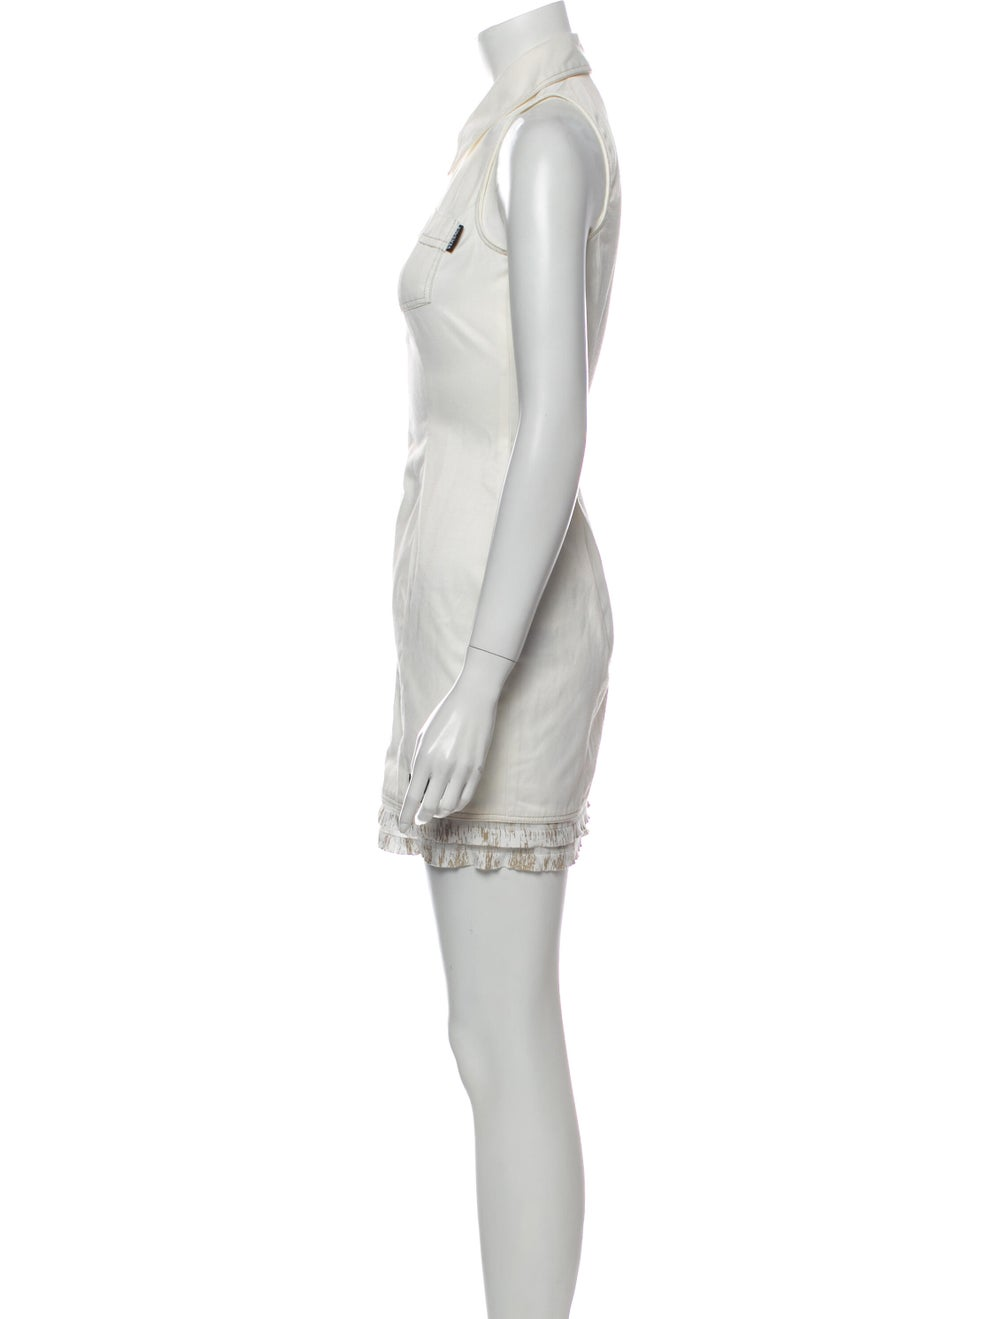 Versace Mini Dress - image 2